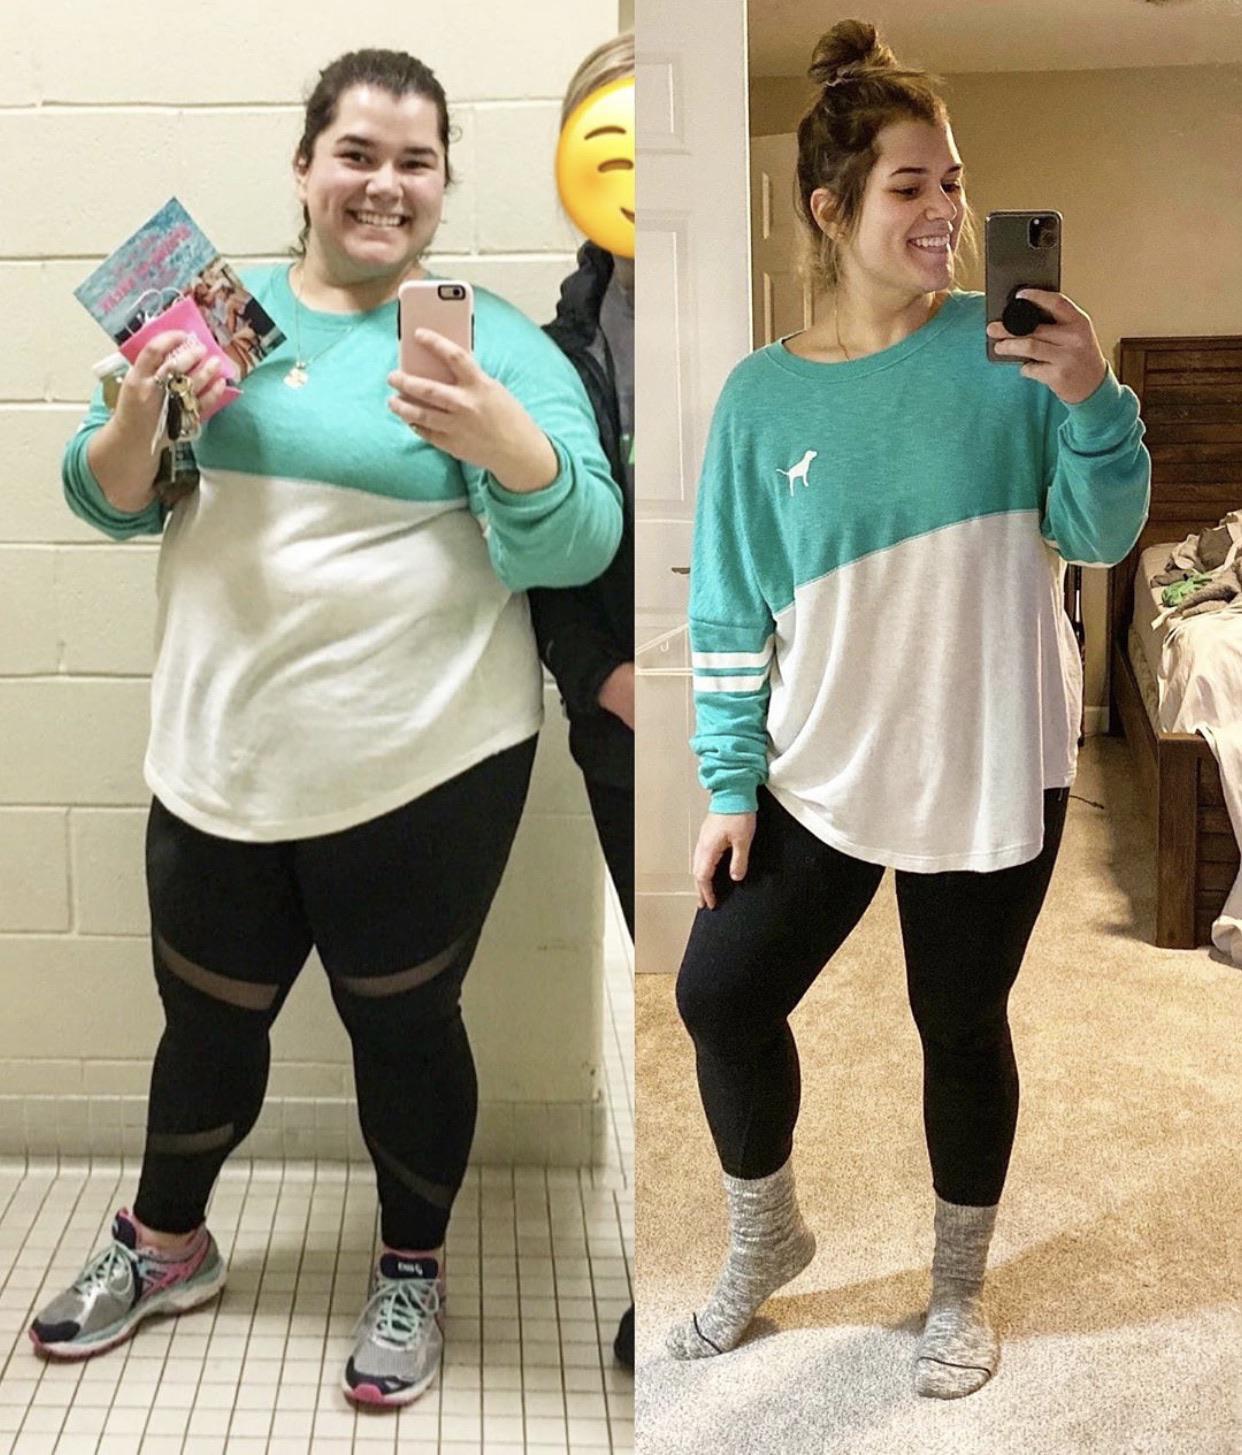 91 lbs Weight Loss 5'3 Female 281 lbs to 190 lbs